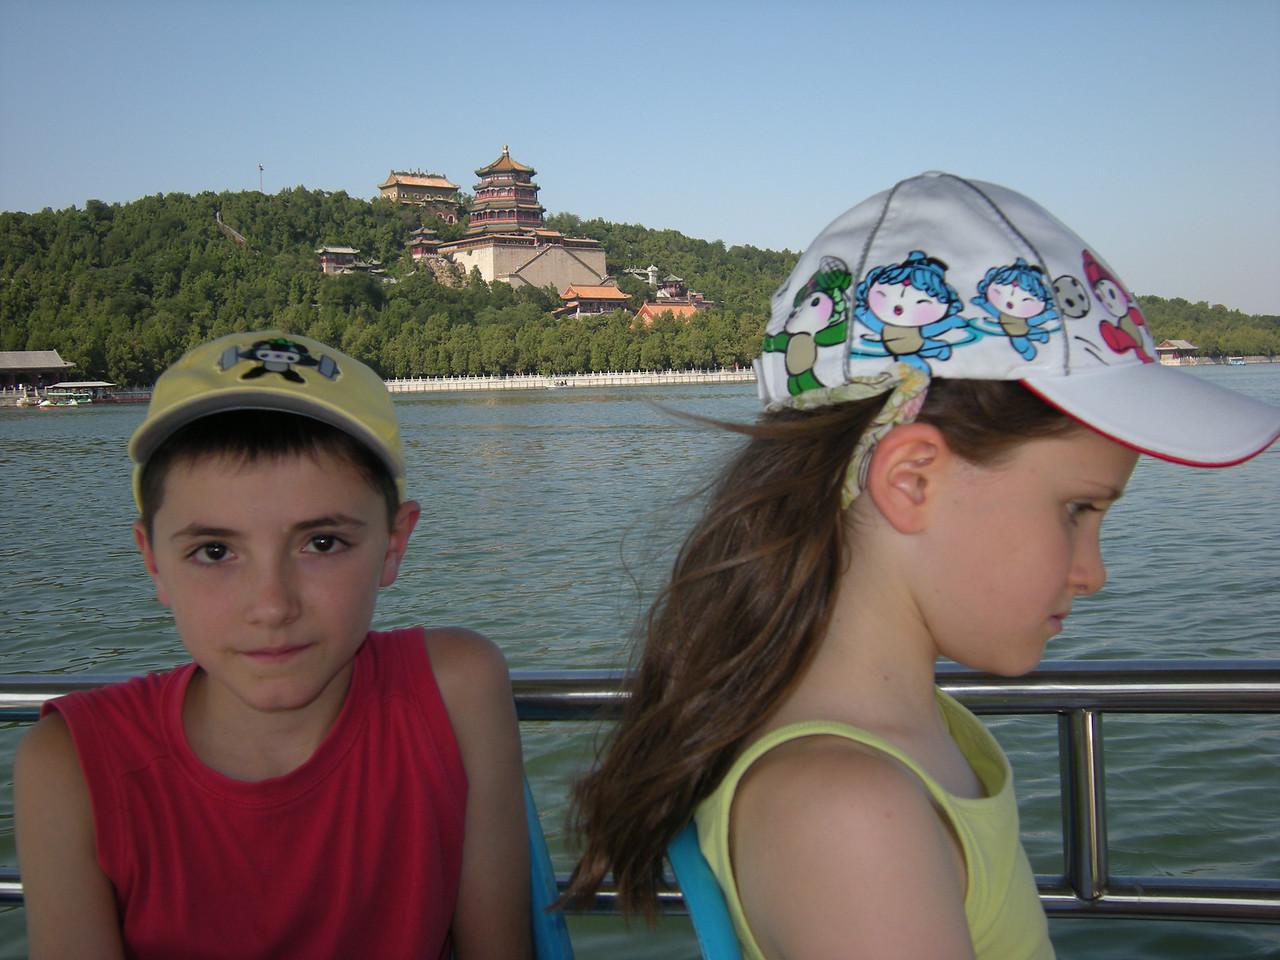 Summer palace children 0808 (2)